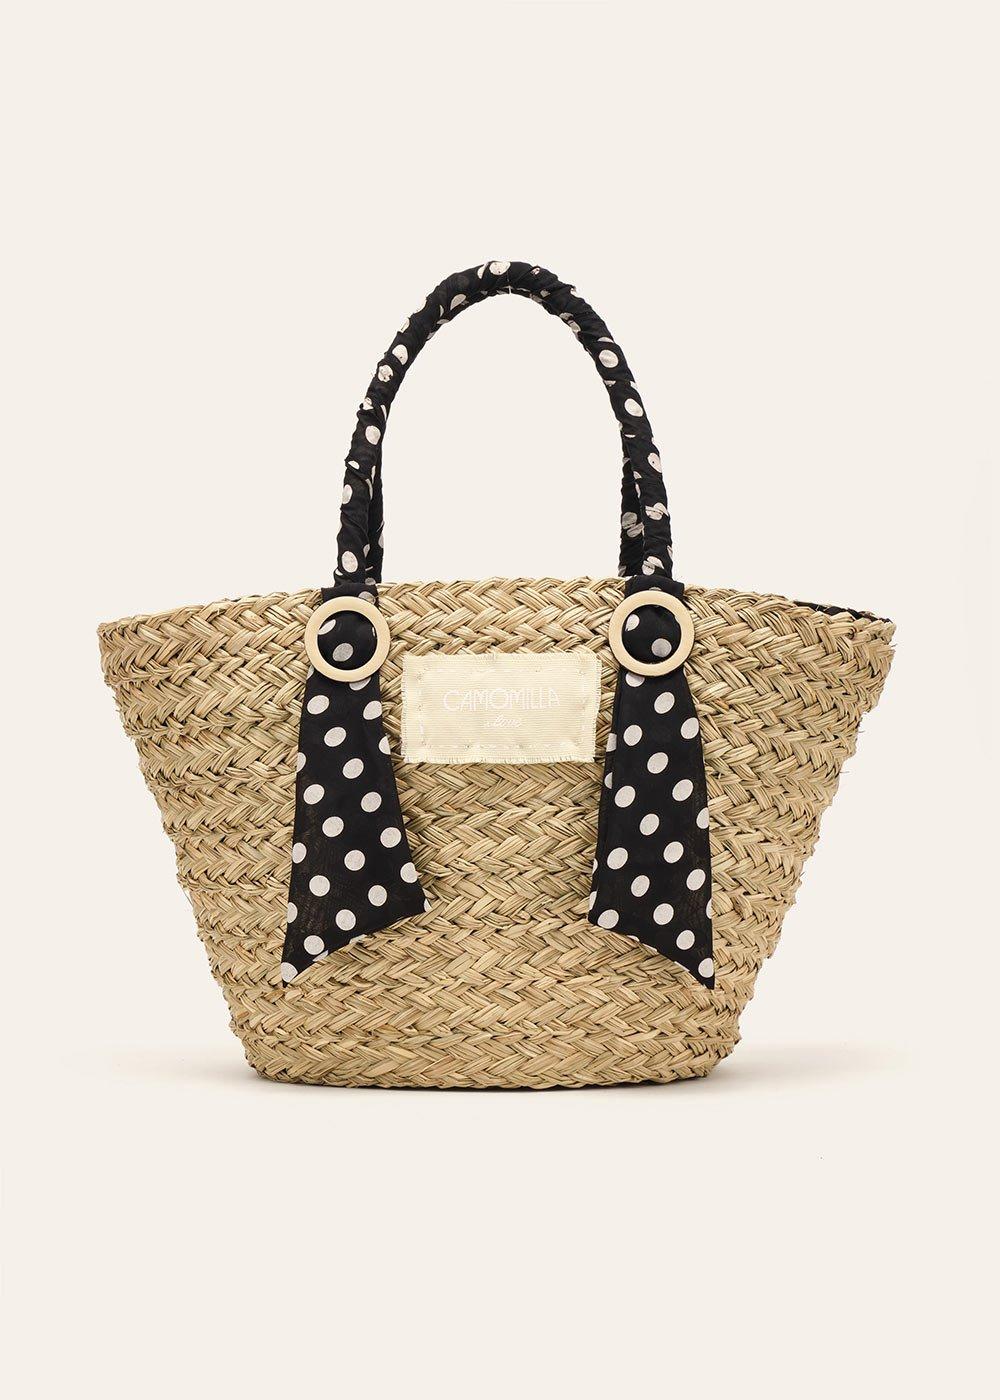 Barny bag with polka dot details - Black / White Pois - Woman